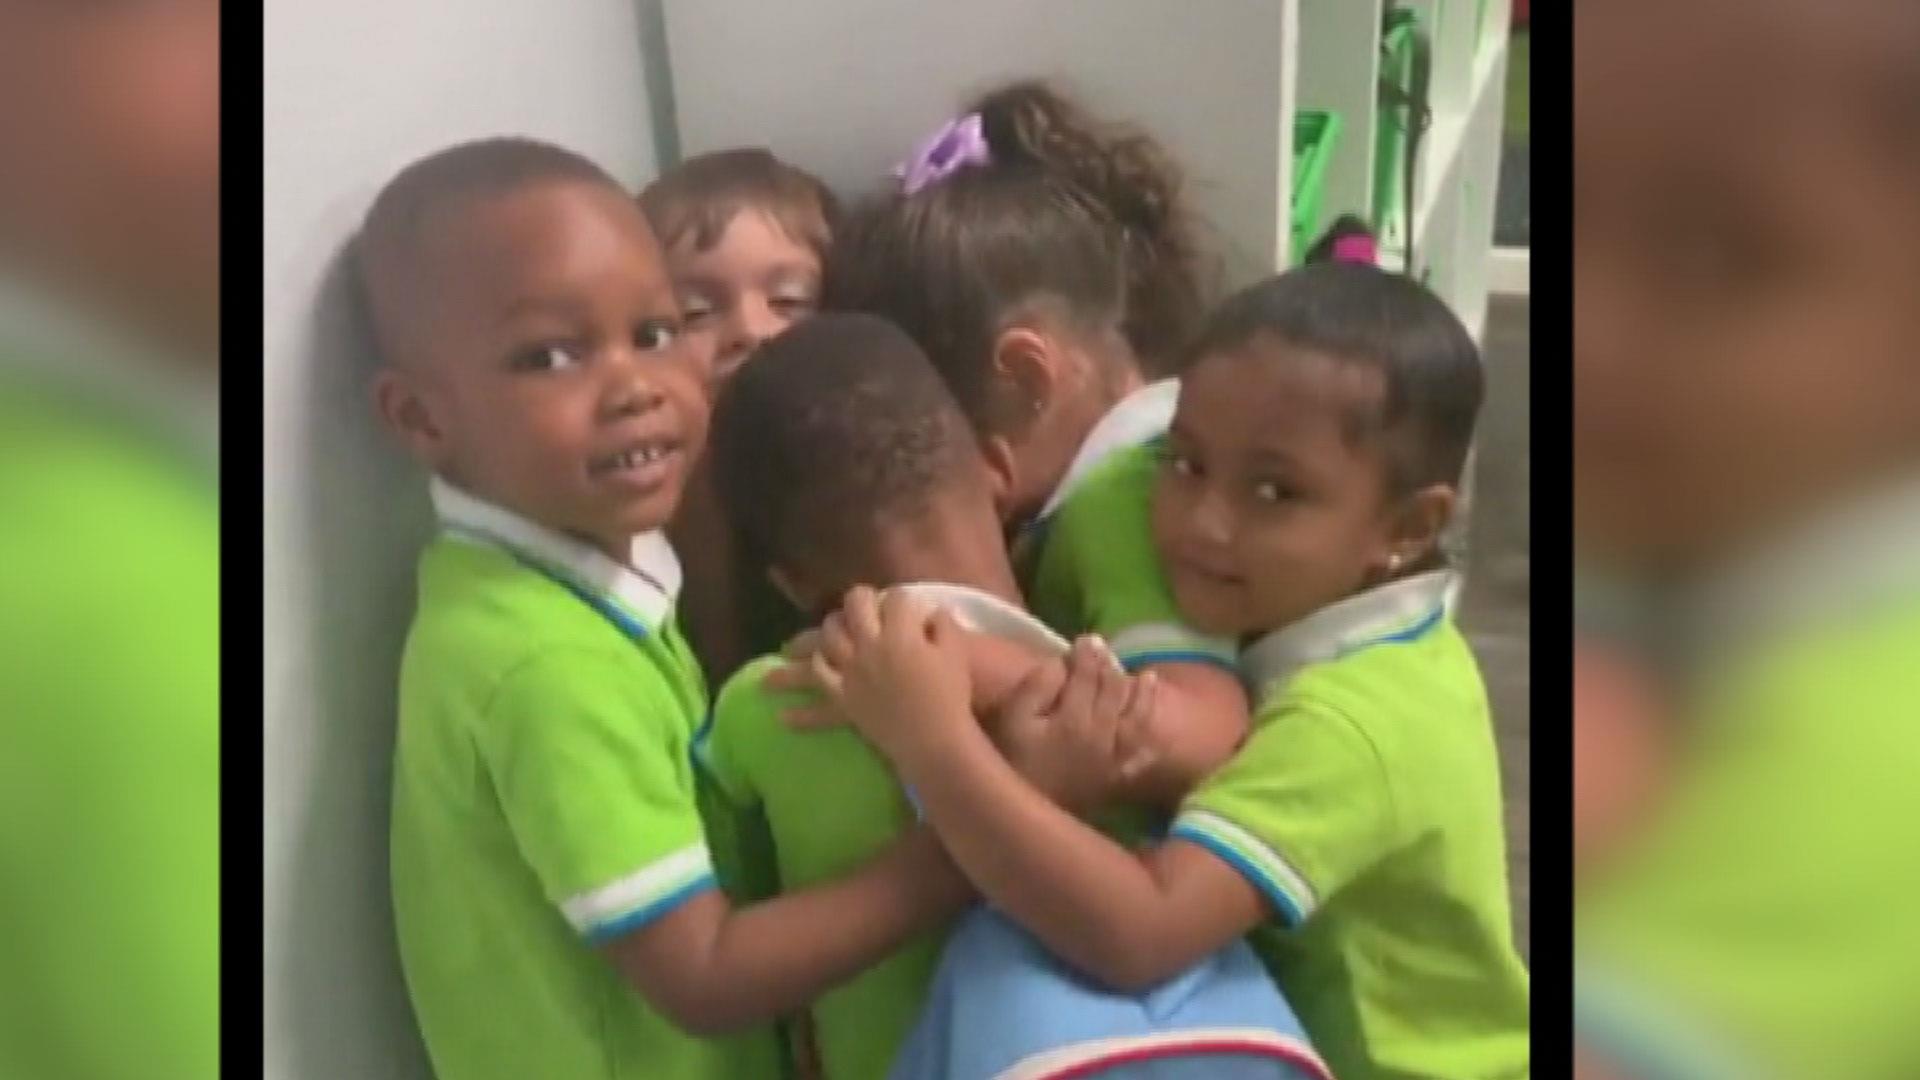 Viral video shows Florida students hugging Hurricane Dorian survivor as he fights back tears